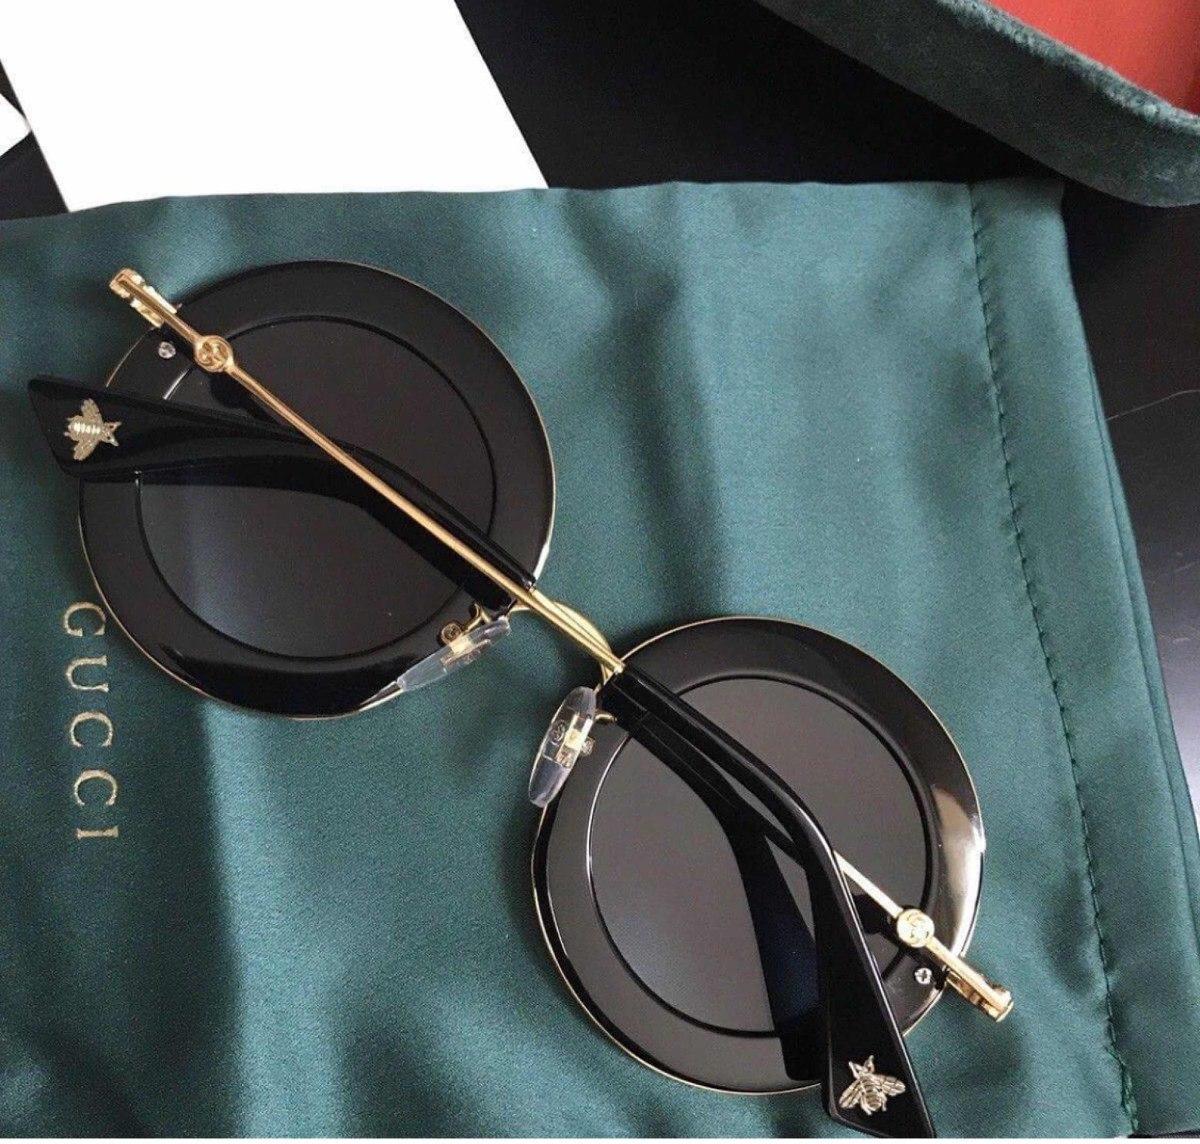 009217adcefd3 óculos gucci laveugle preto estojo e certi ori novo original. Carregando  zoom.